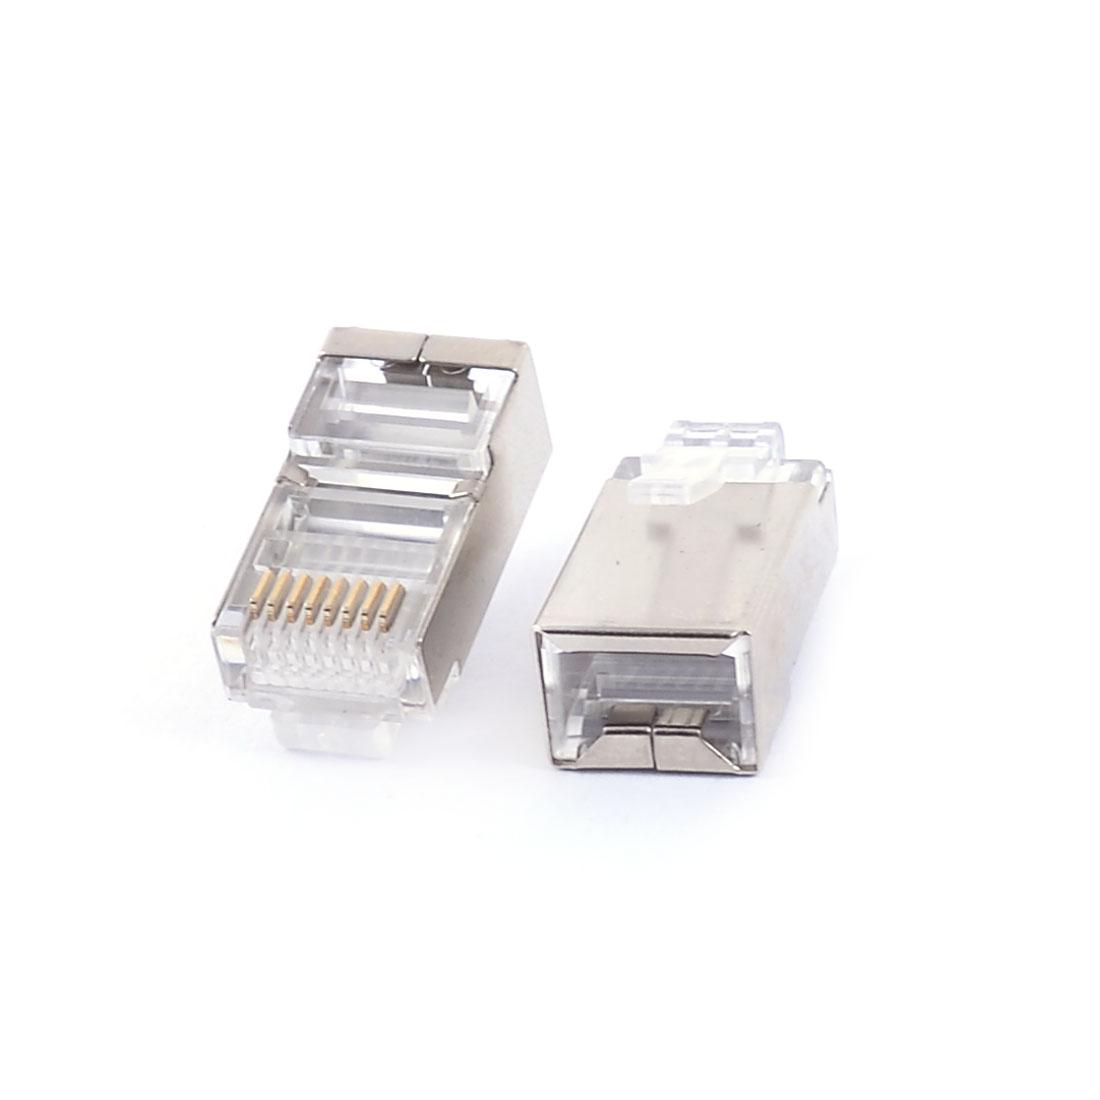 RJ45 8P8C CAT5 Modular Network Crimp Adapter Ethernet Jack Connector 7Pcs - image 1 of 2